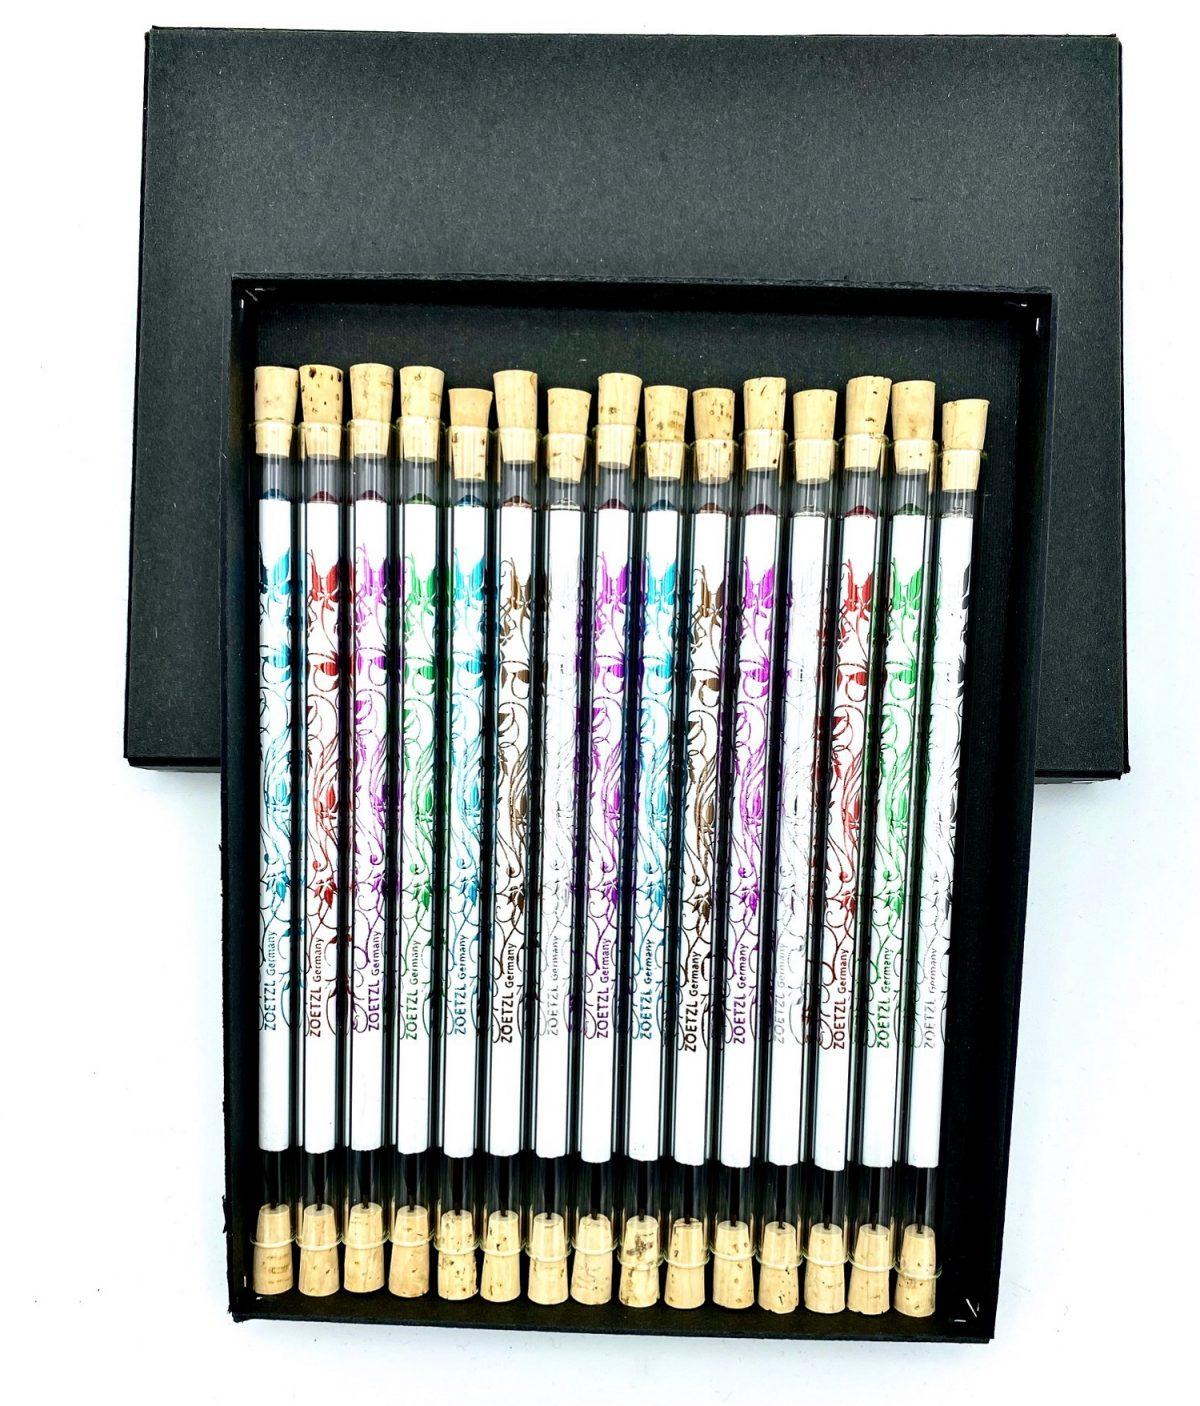 TD102  -  GlasTrinkhalme mit Pencil